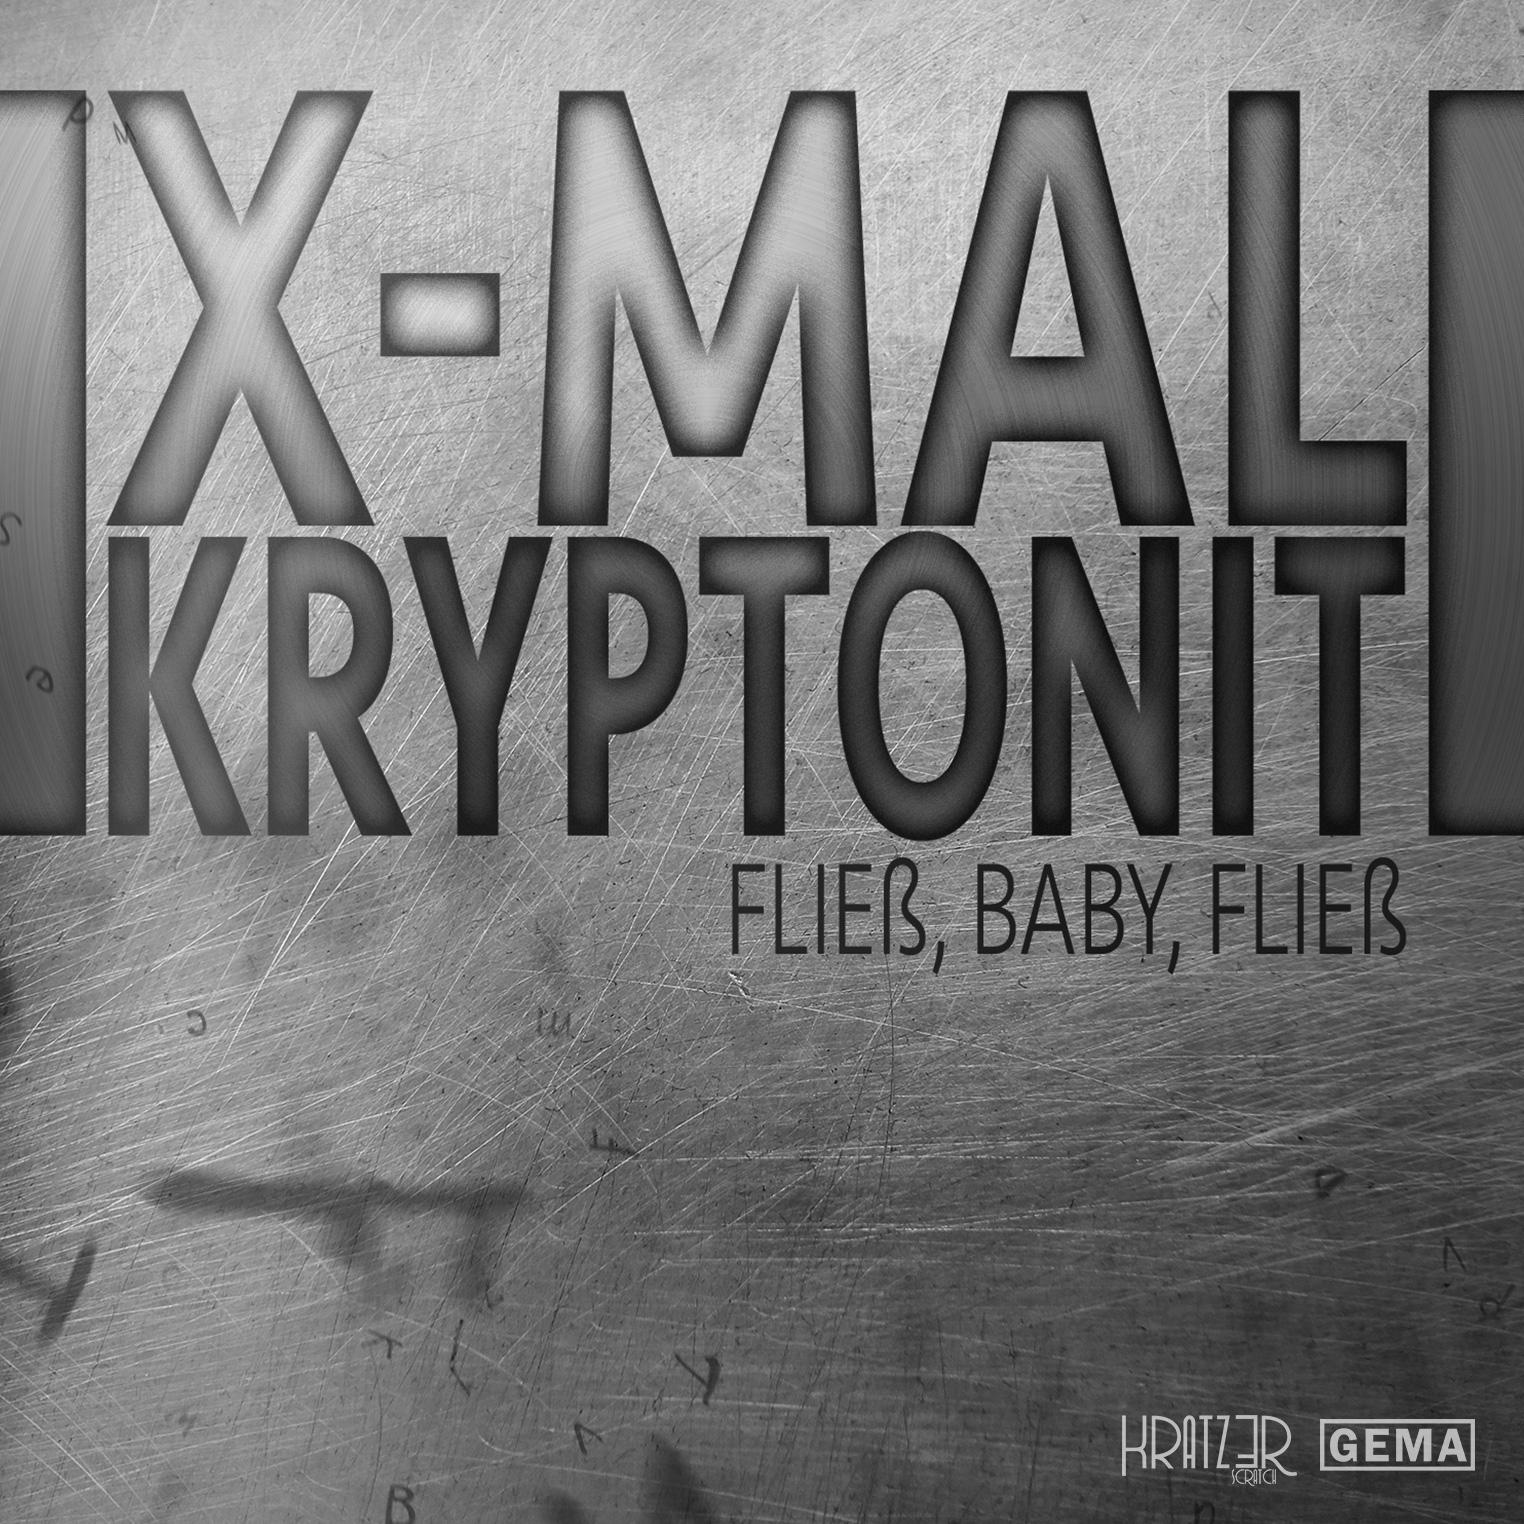 X-mal Kryptonit – Fließ, Baby, fließ